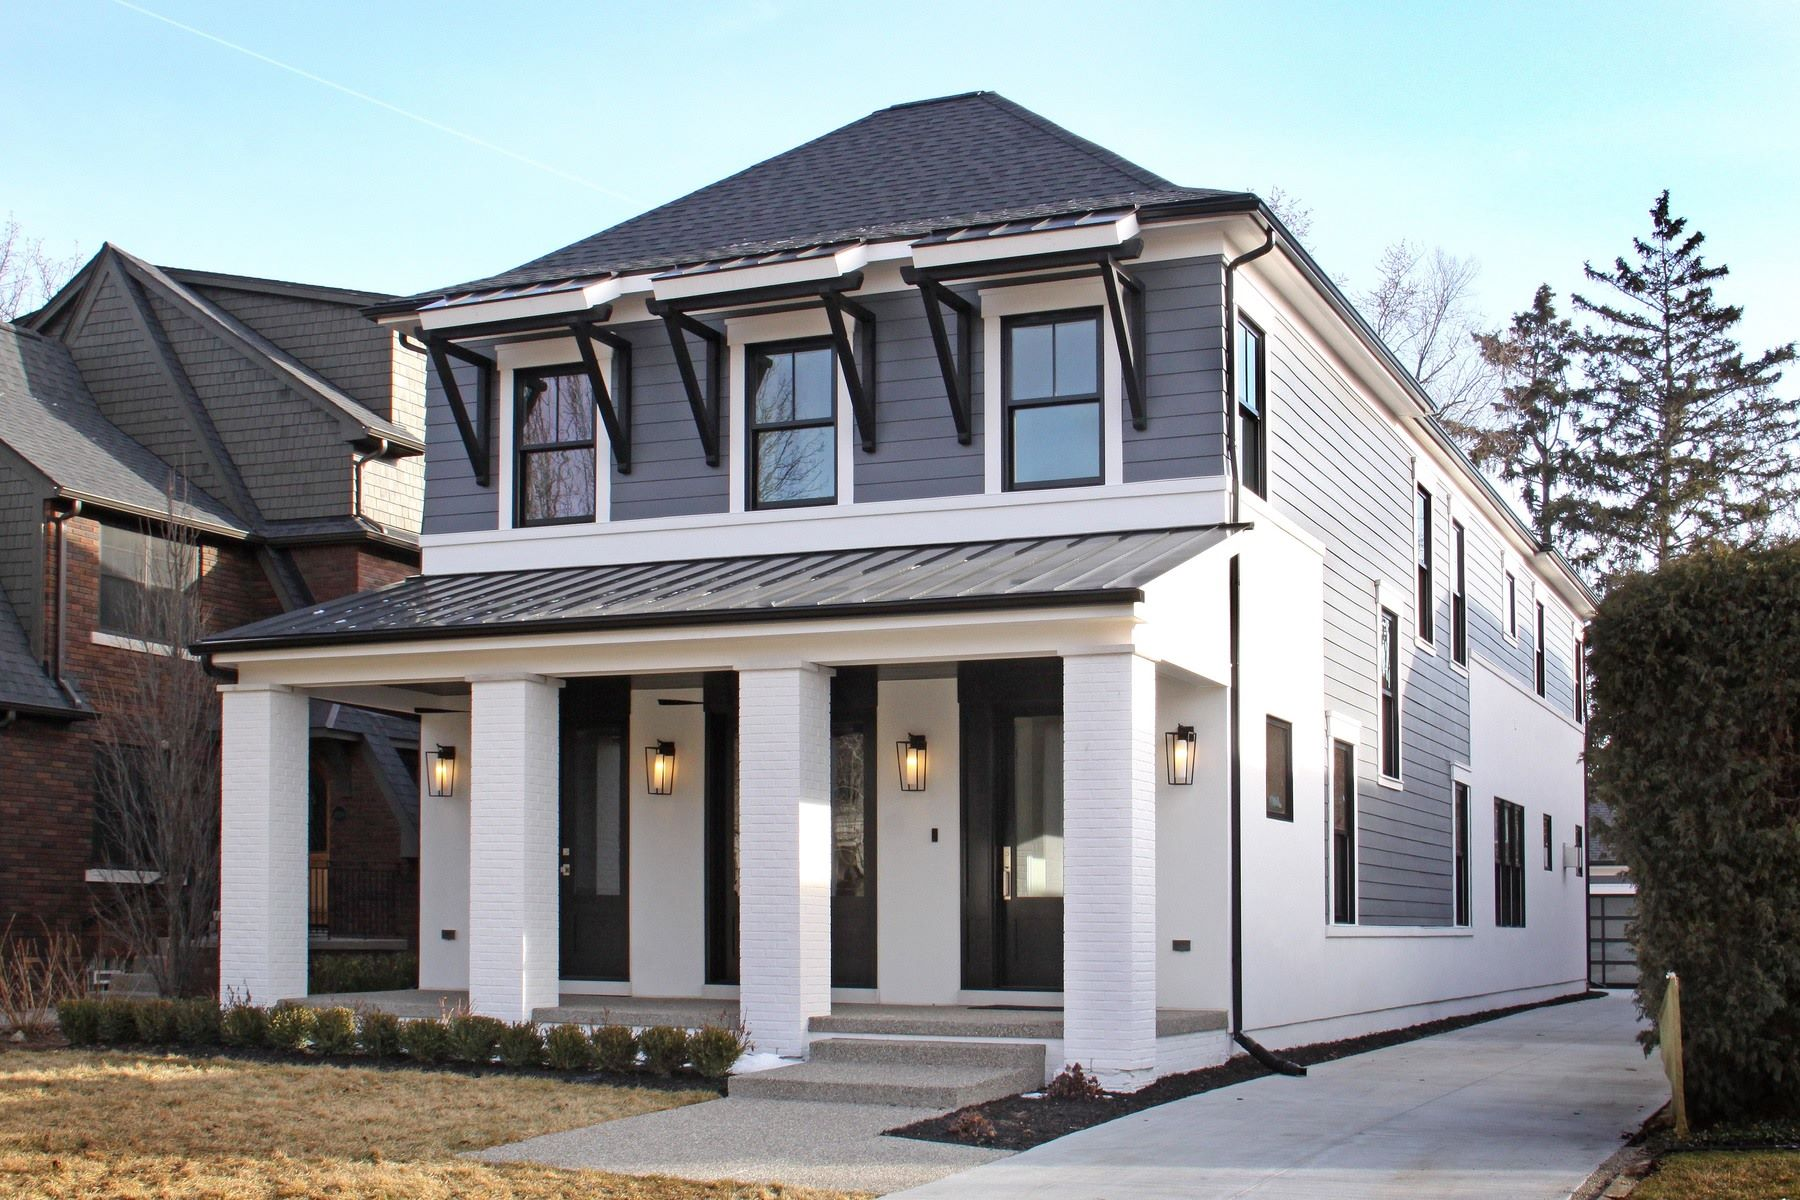 Single Family Homes for Sale at Birmingham 873 Watkins Street Birmingham, Michigan 48009 United States